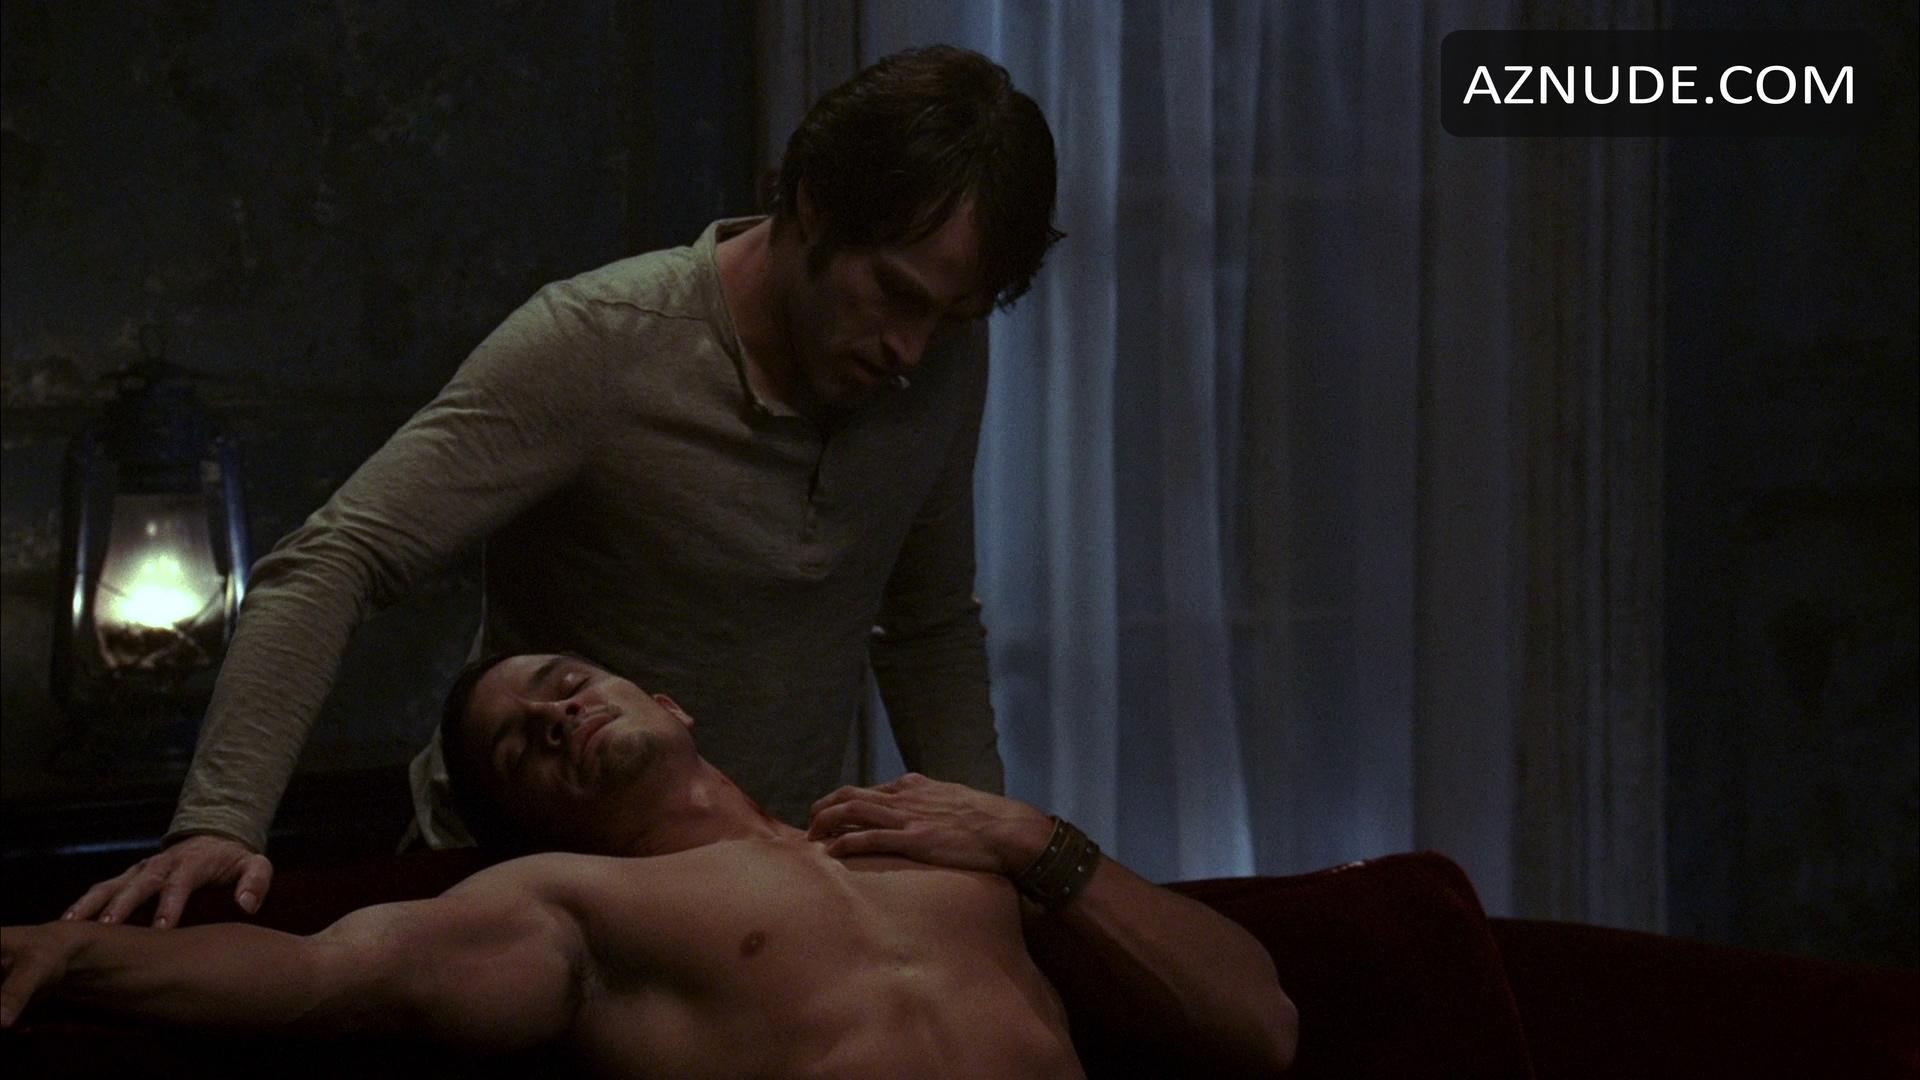 Angie Noir Actriz Porno showing porn images for rick gonzalez gay star porn | www